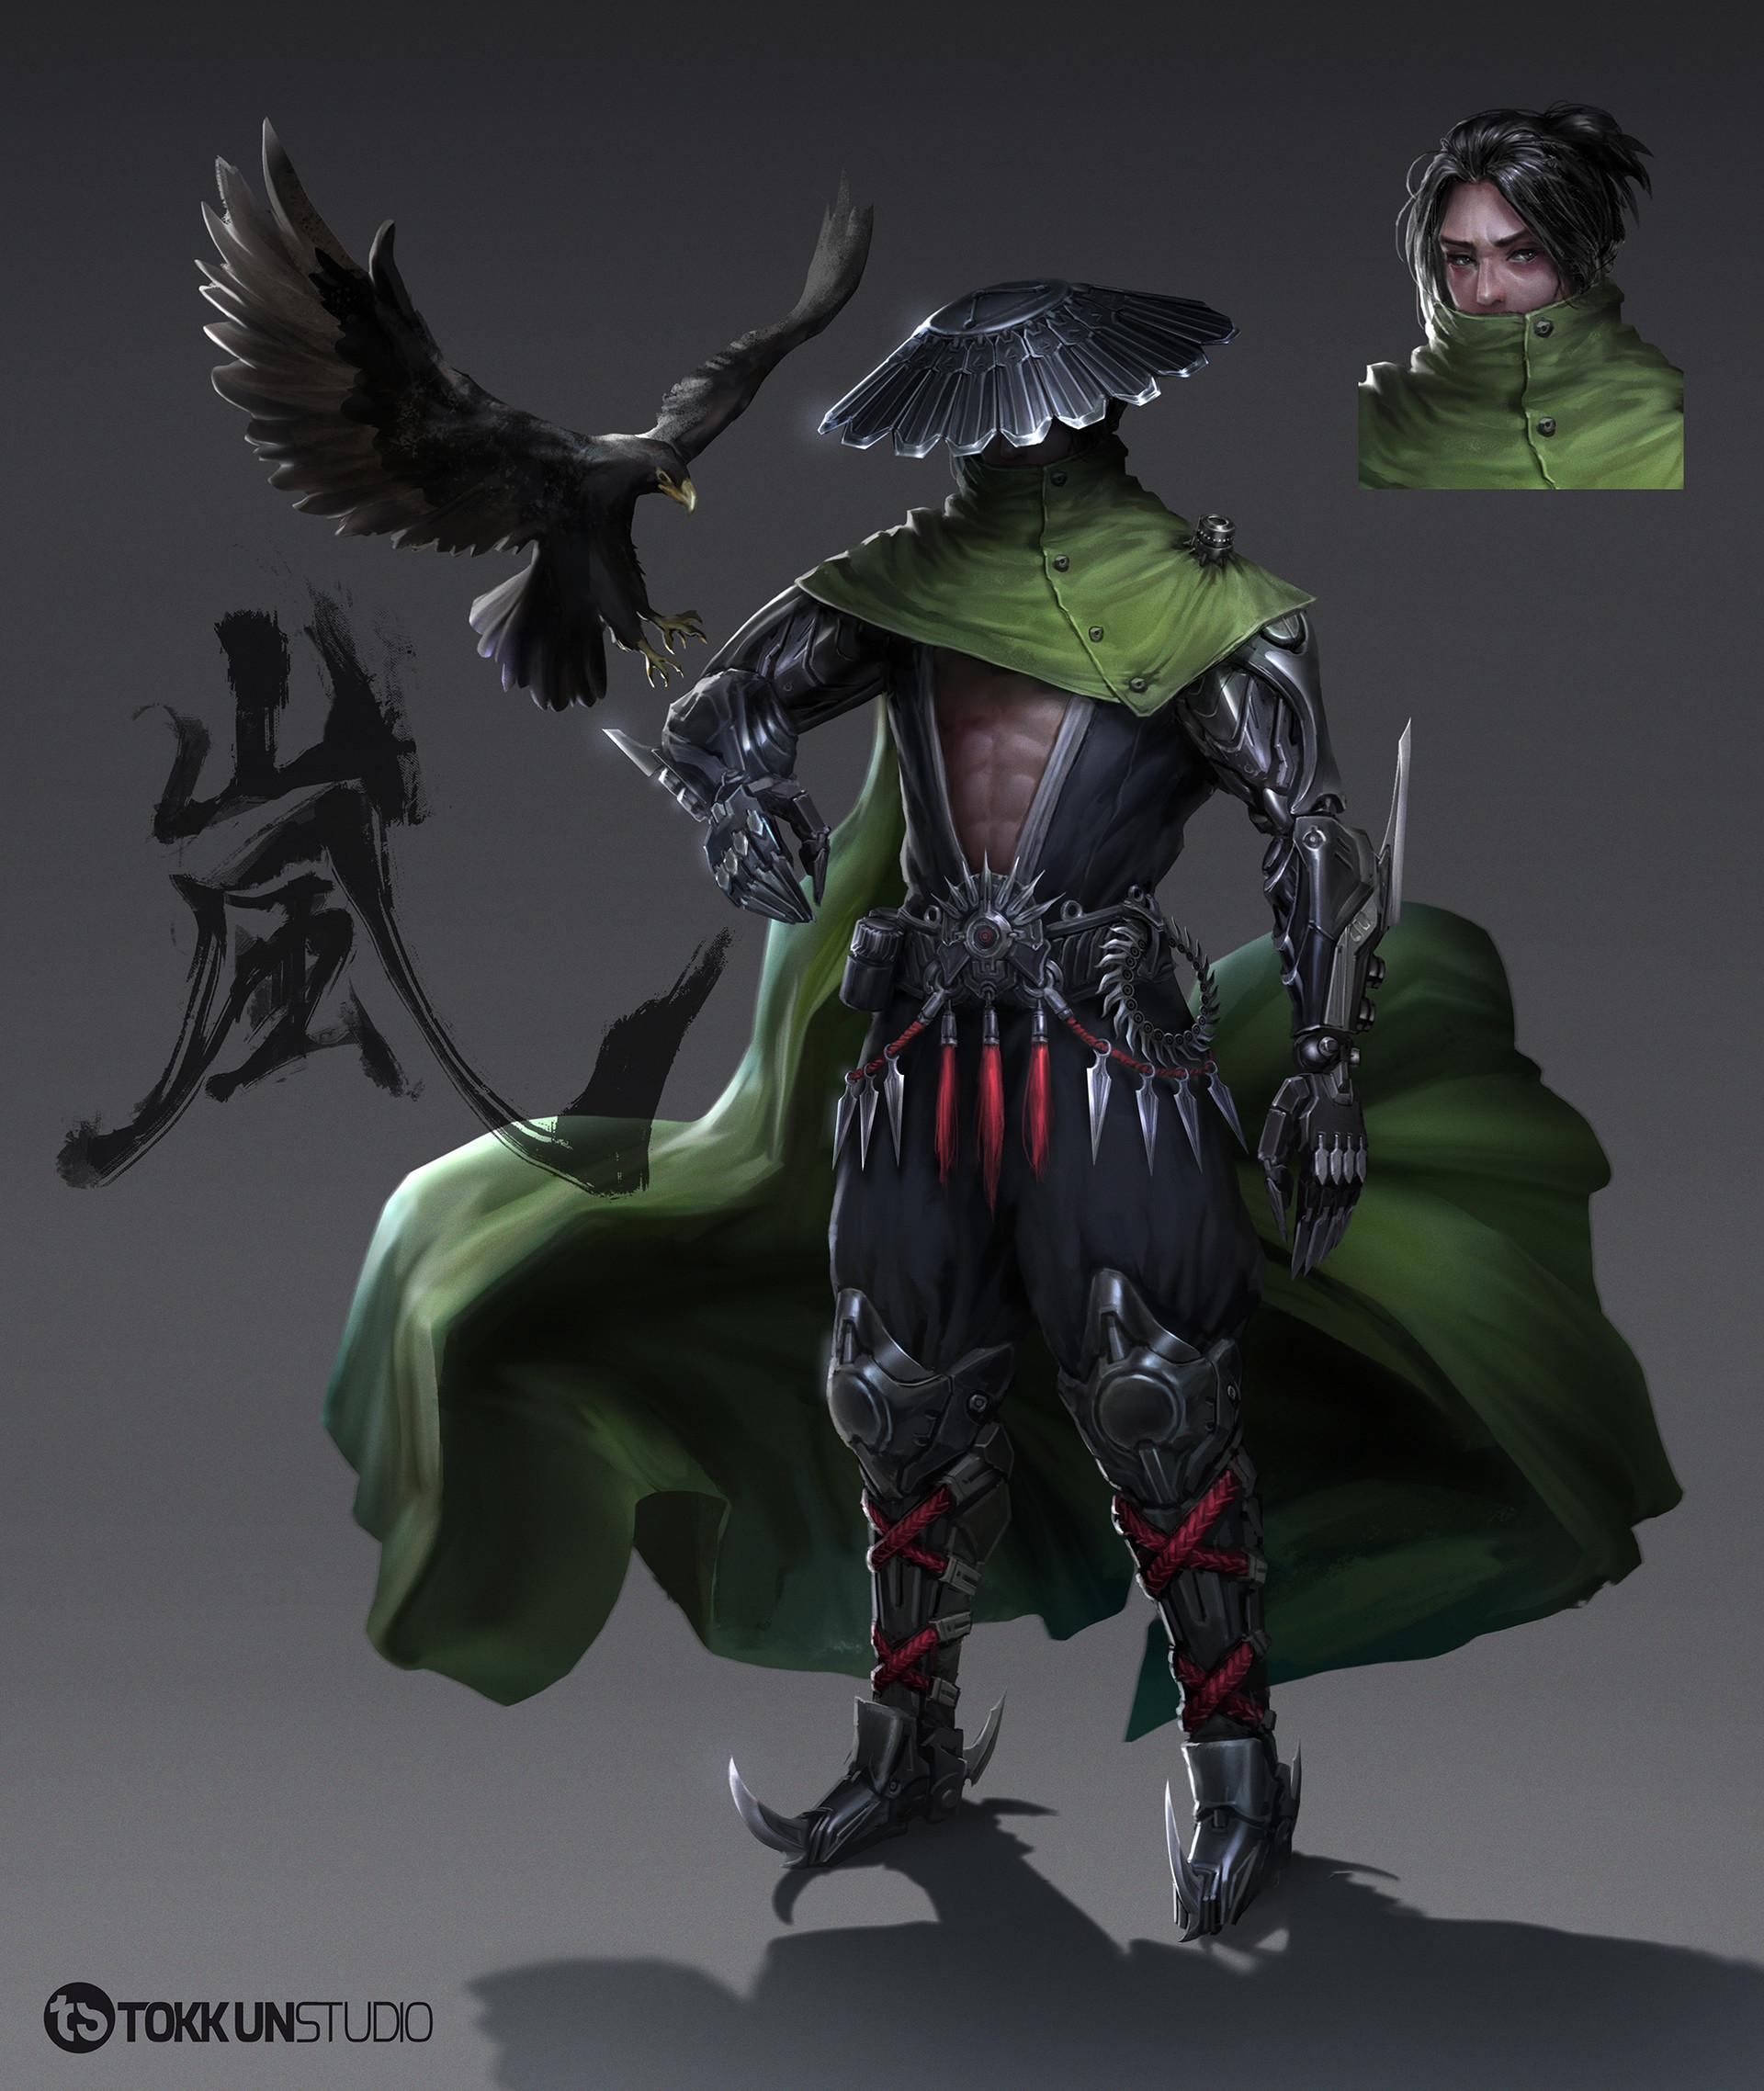 Tokkun studio character 3